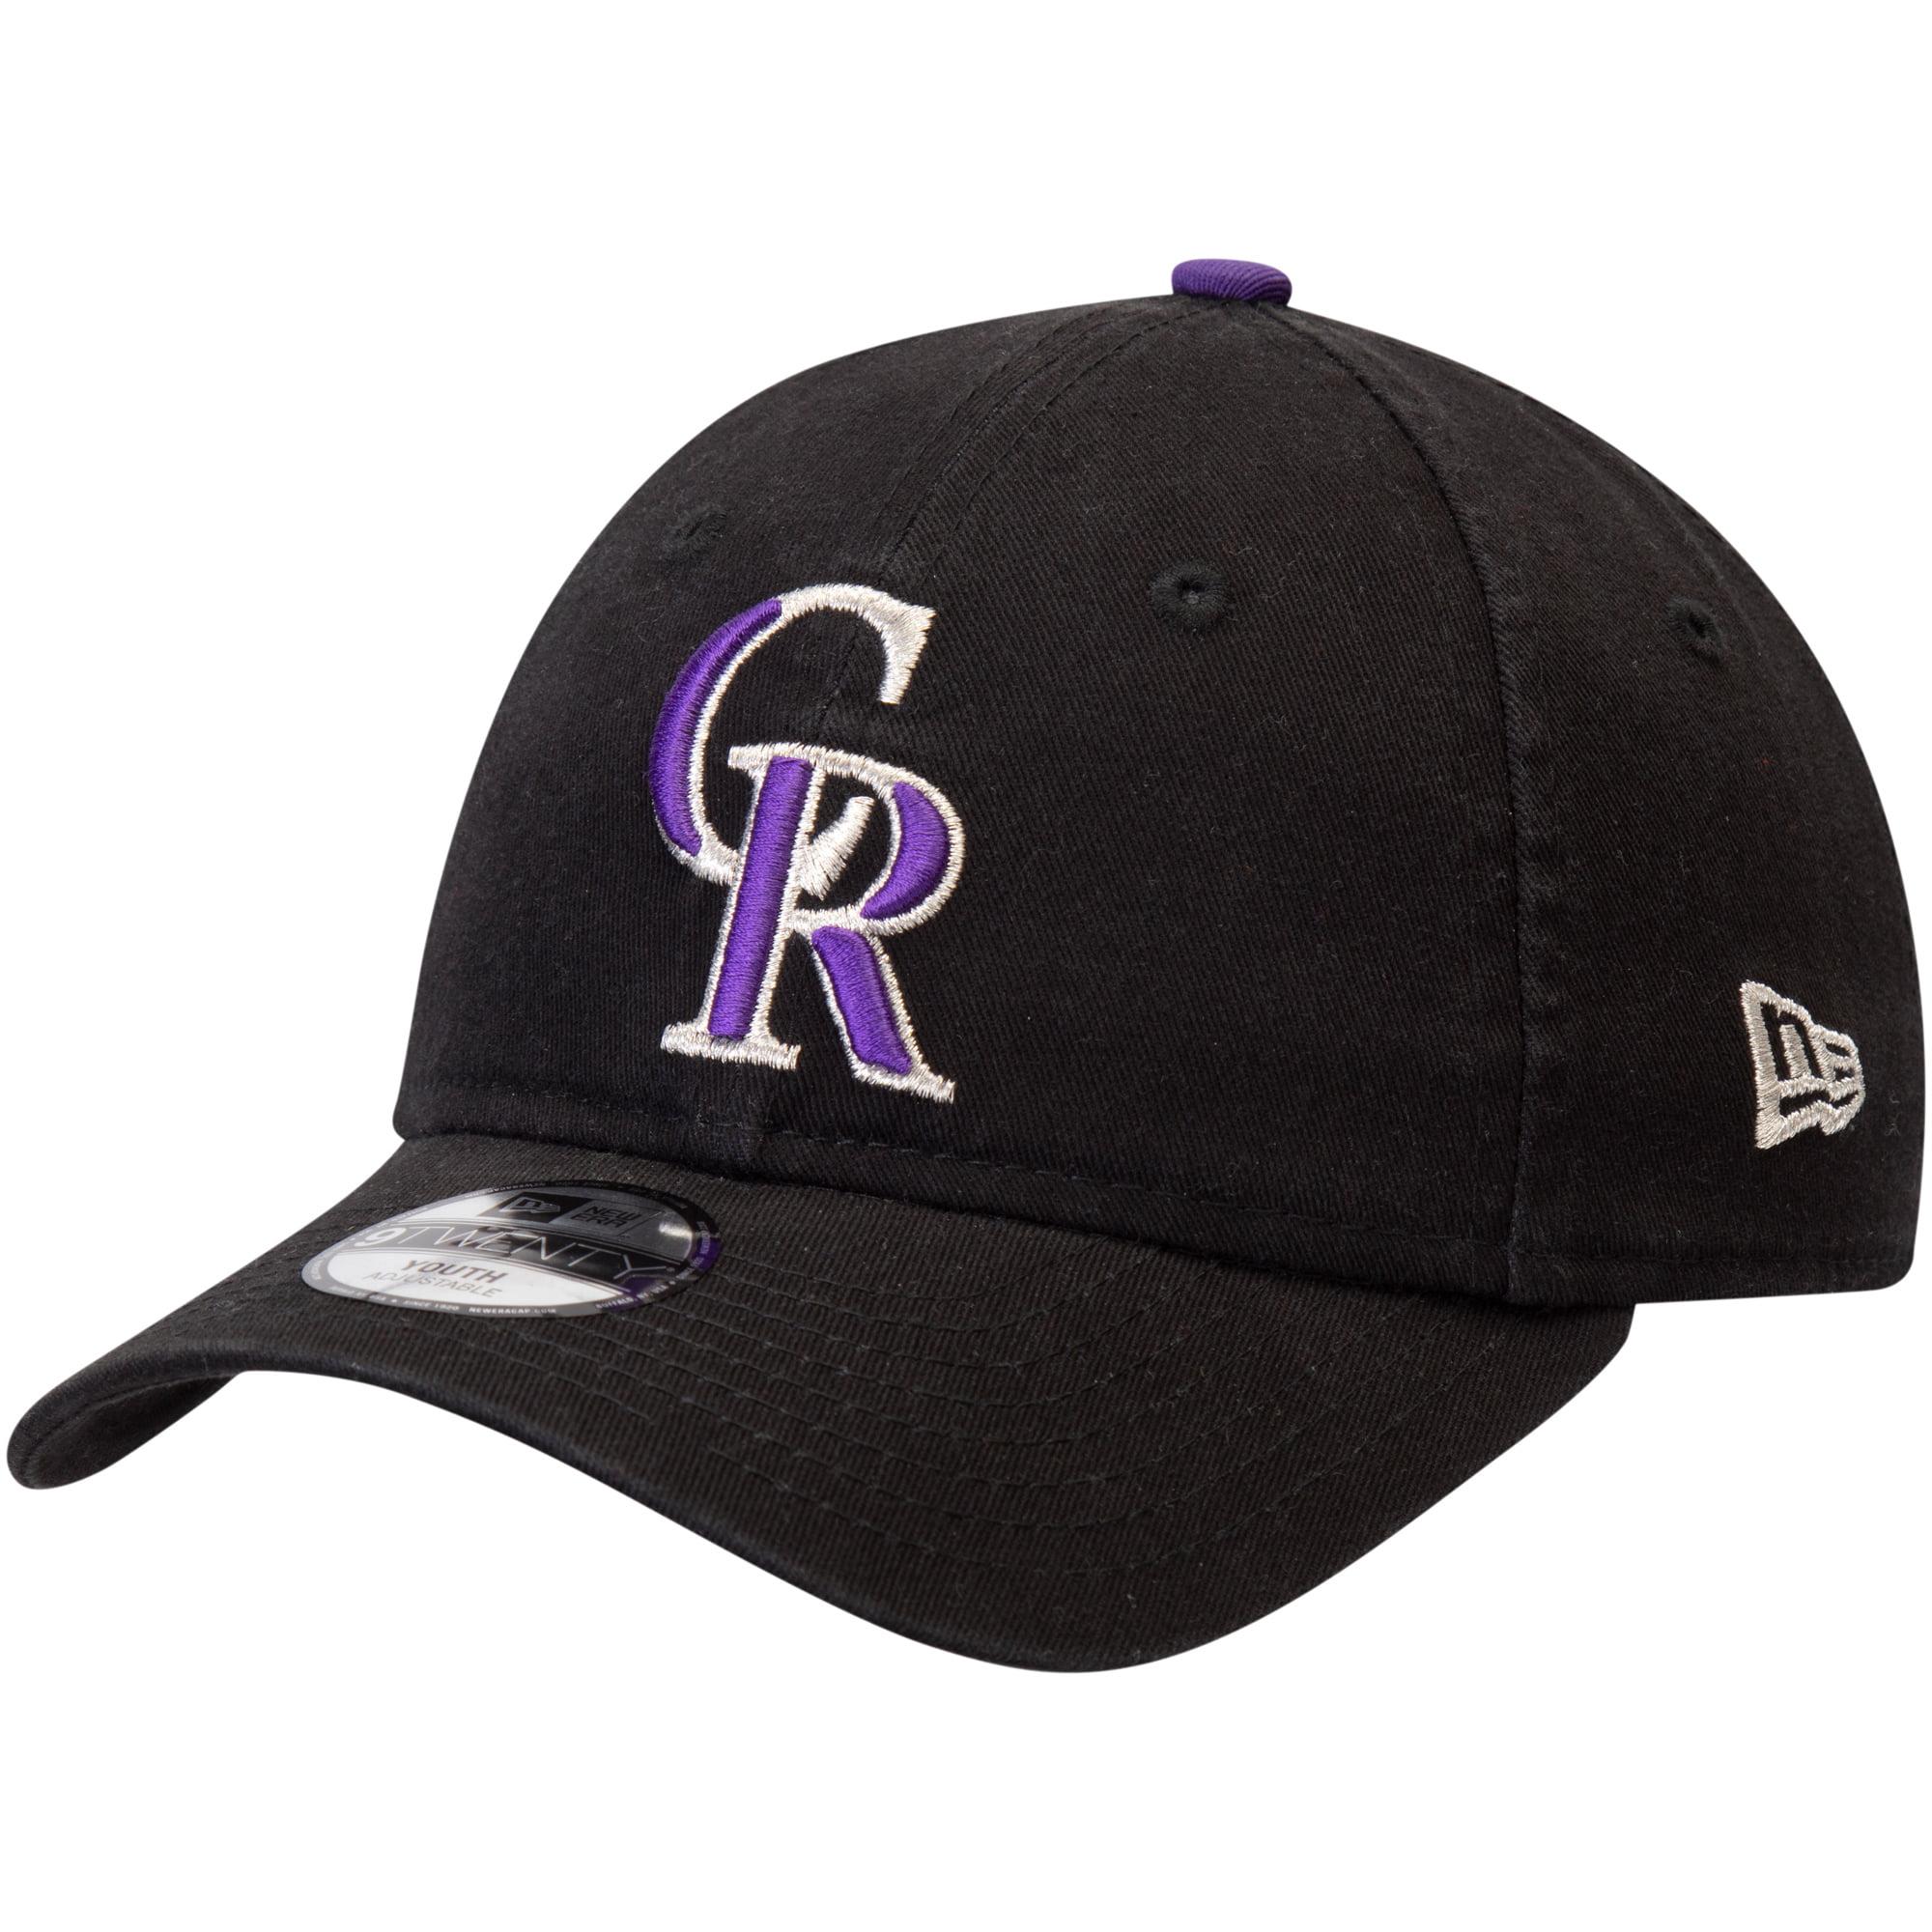 Colorado Rockies New Era Youth Core Classic Replica 9TWENTY Adjustable Hat - Black - OSFA